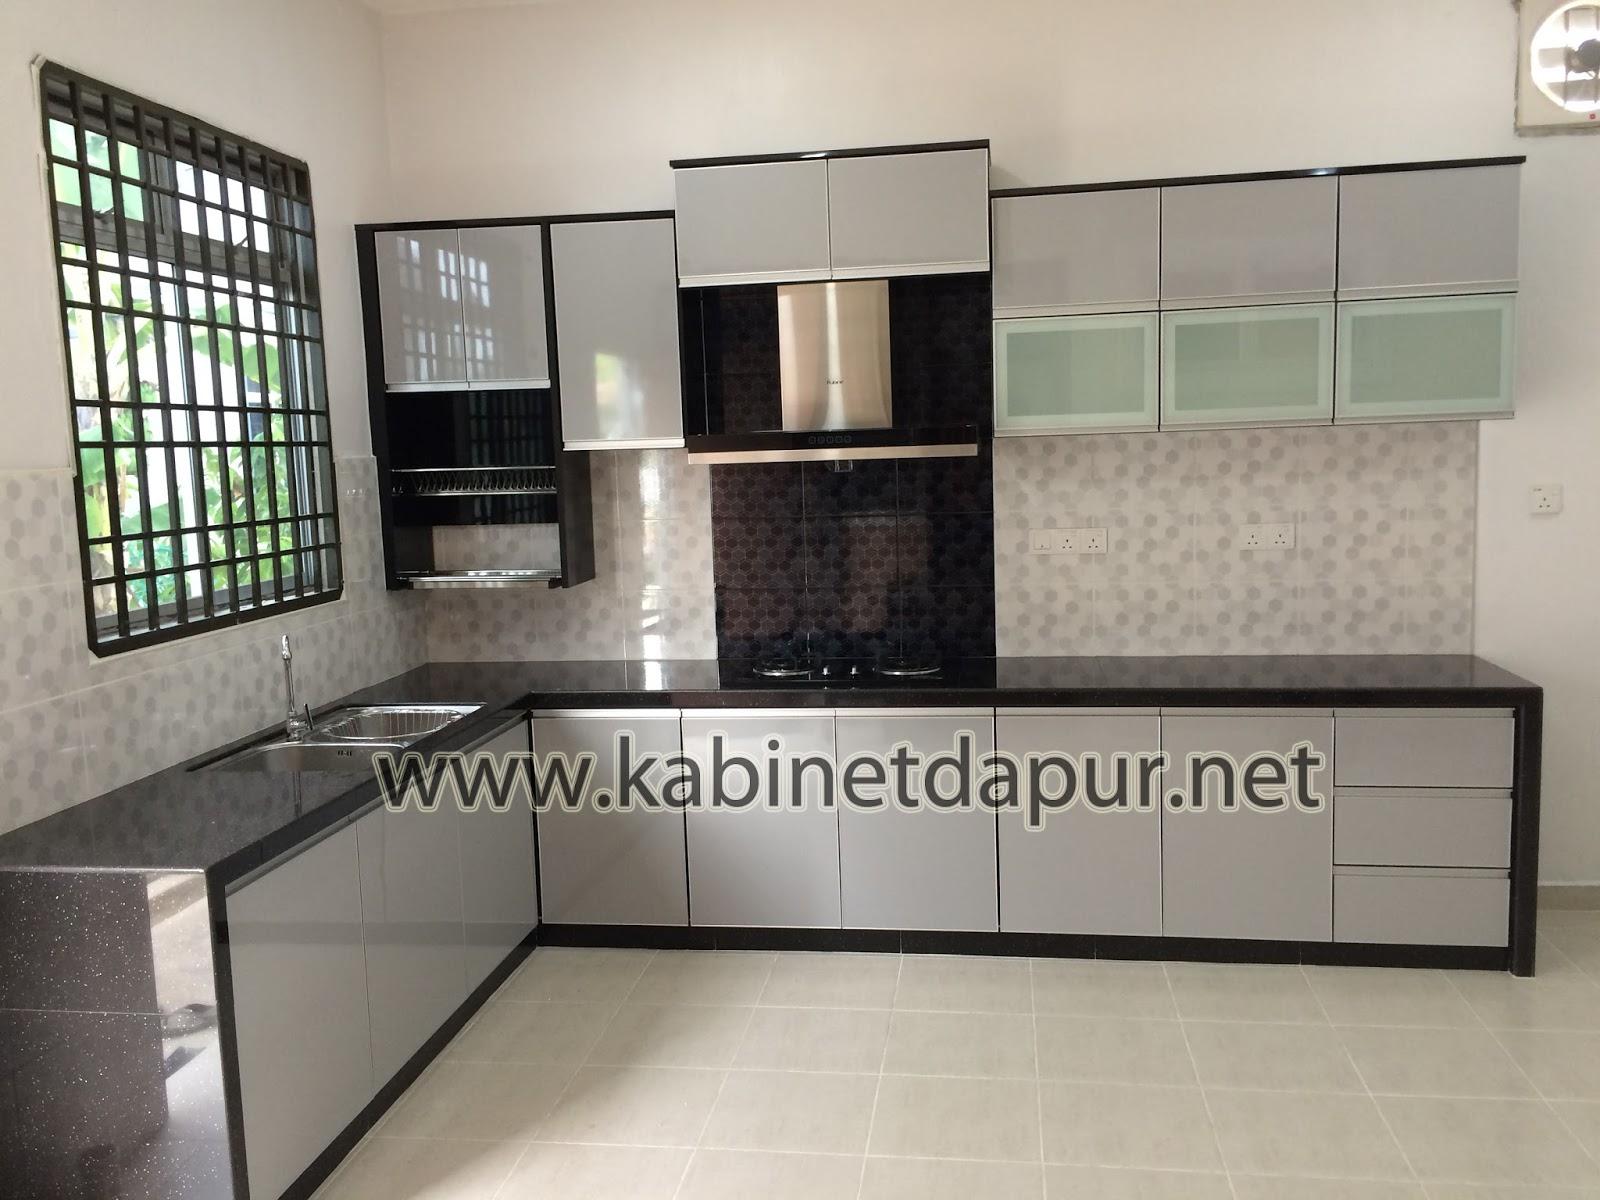 Projek Kabinet Dapur Di Mentaloon Alor Setar Tel 0124934710 En Amir Moden